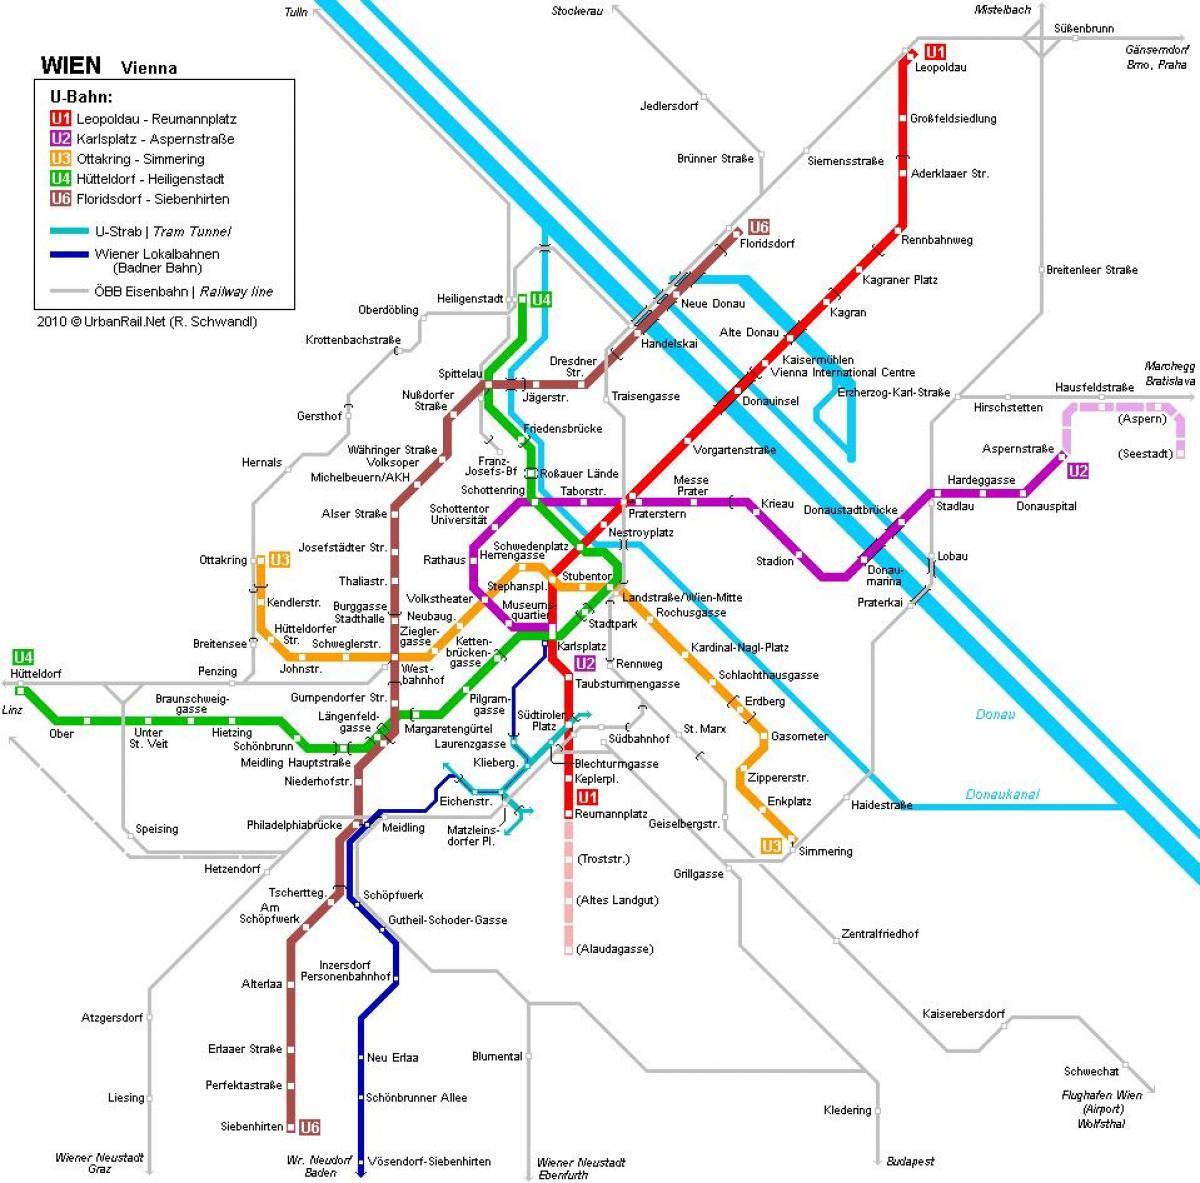 Becs Ausztria Foldalatti Terkep Becsi Metro Terkep Hauptbahnhof